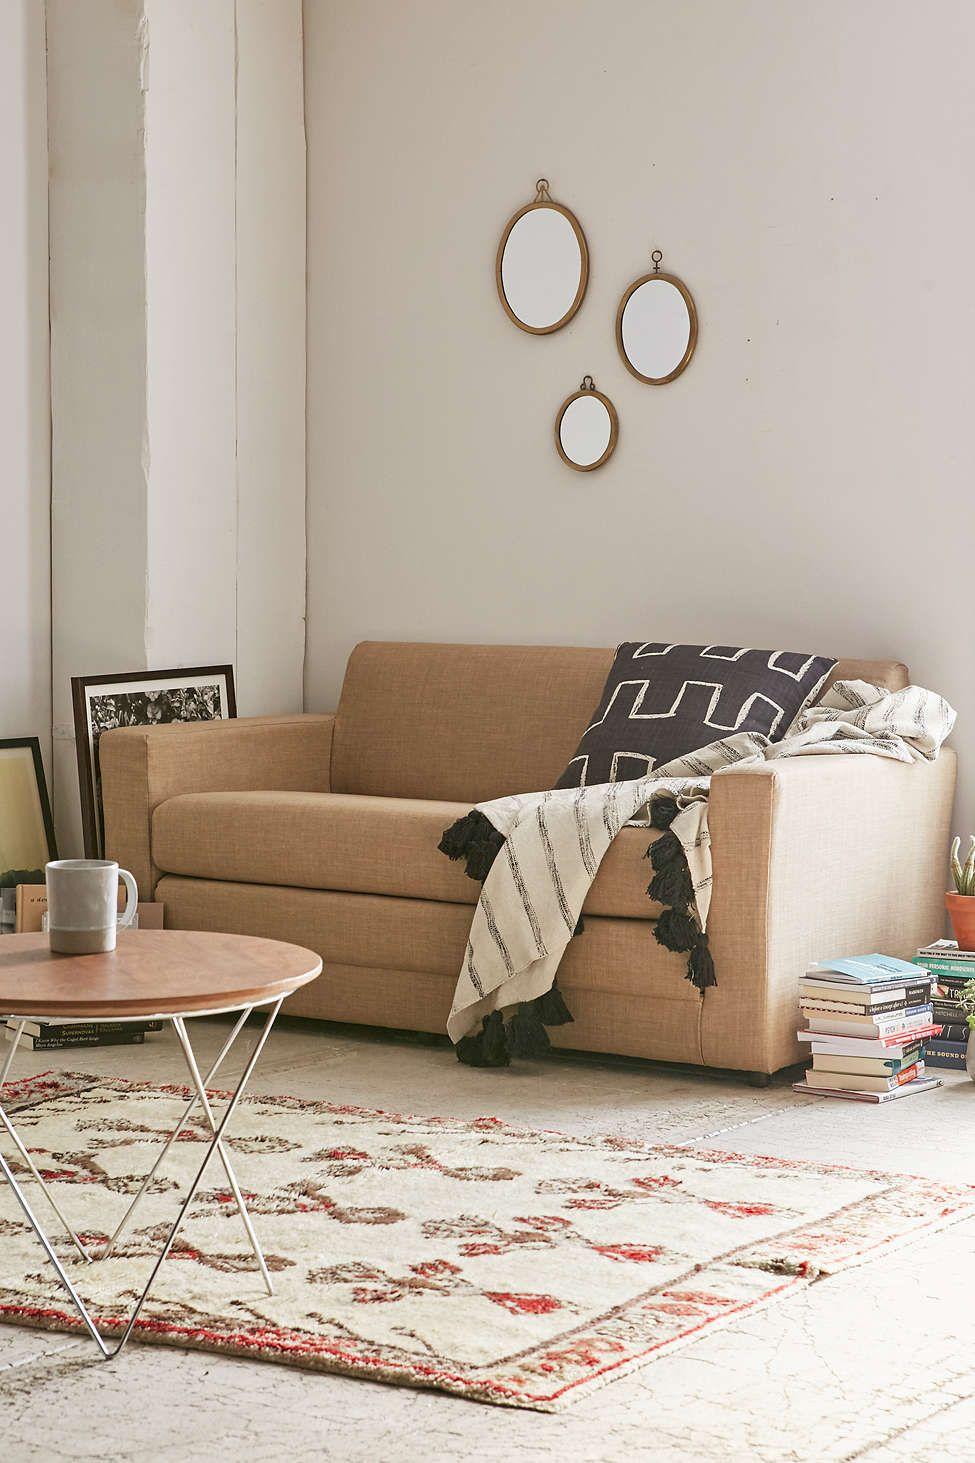 Anywhere Sleeper Sofa  Canapé neutre, Meuble, Canape lit convertible